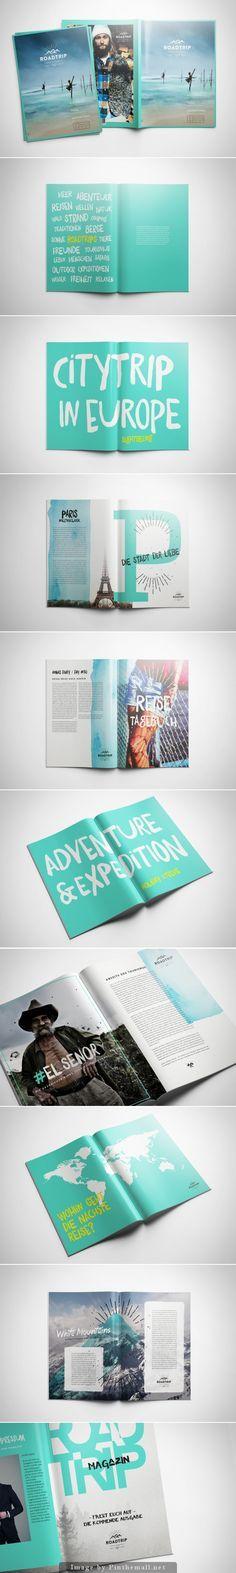 Road Trip Magazine--Could create a san diego adventure mini magazine